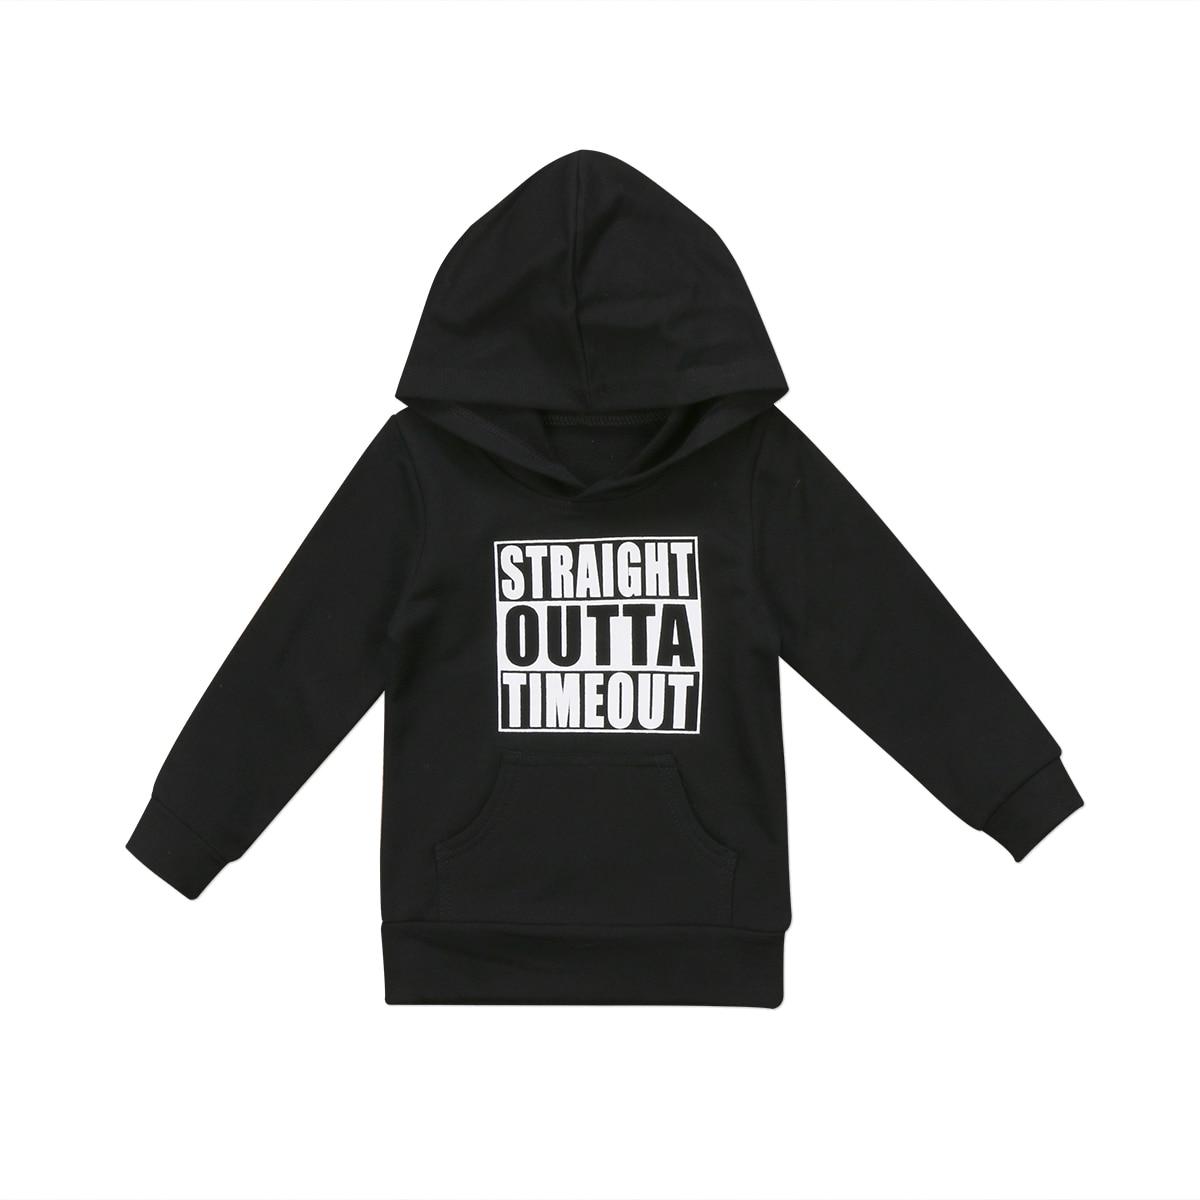 Pudcoco US Stock Newborn KIds Baby Boy Girl Clothes Hoodie Tops Hooded Sweatshirt Casual Outdoor Sport 7